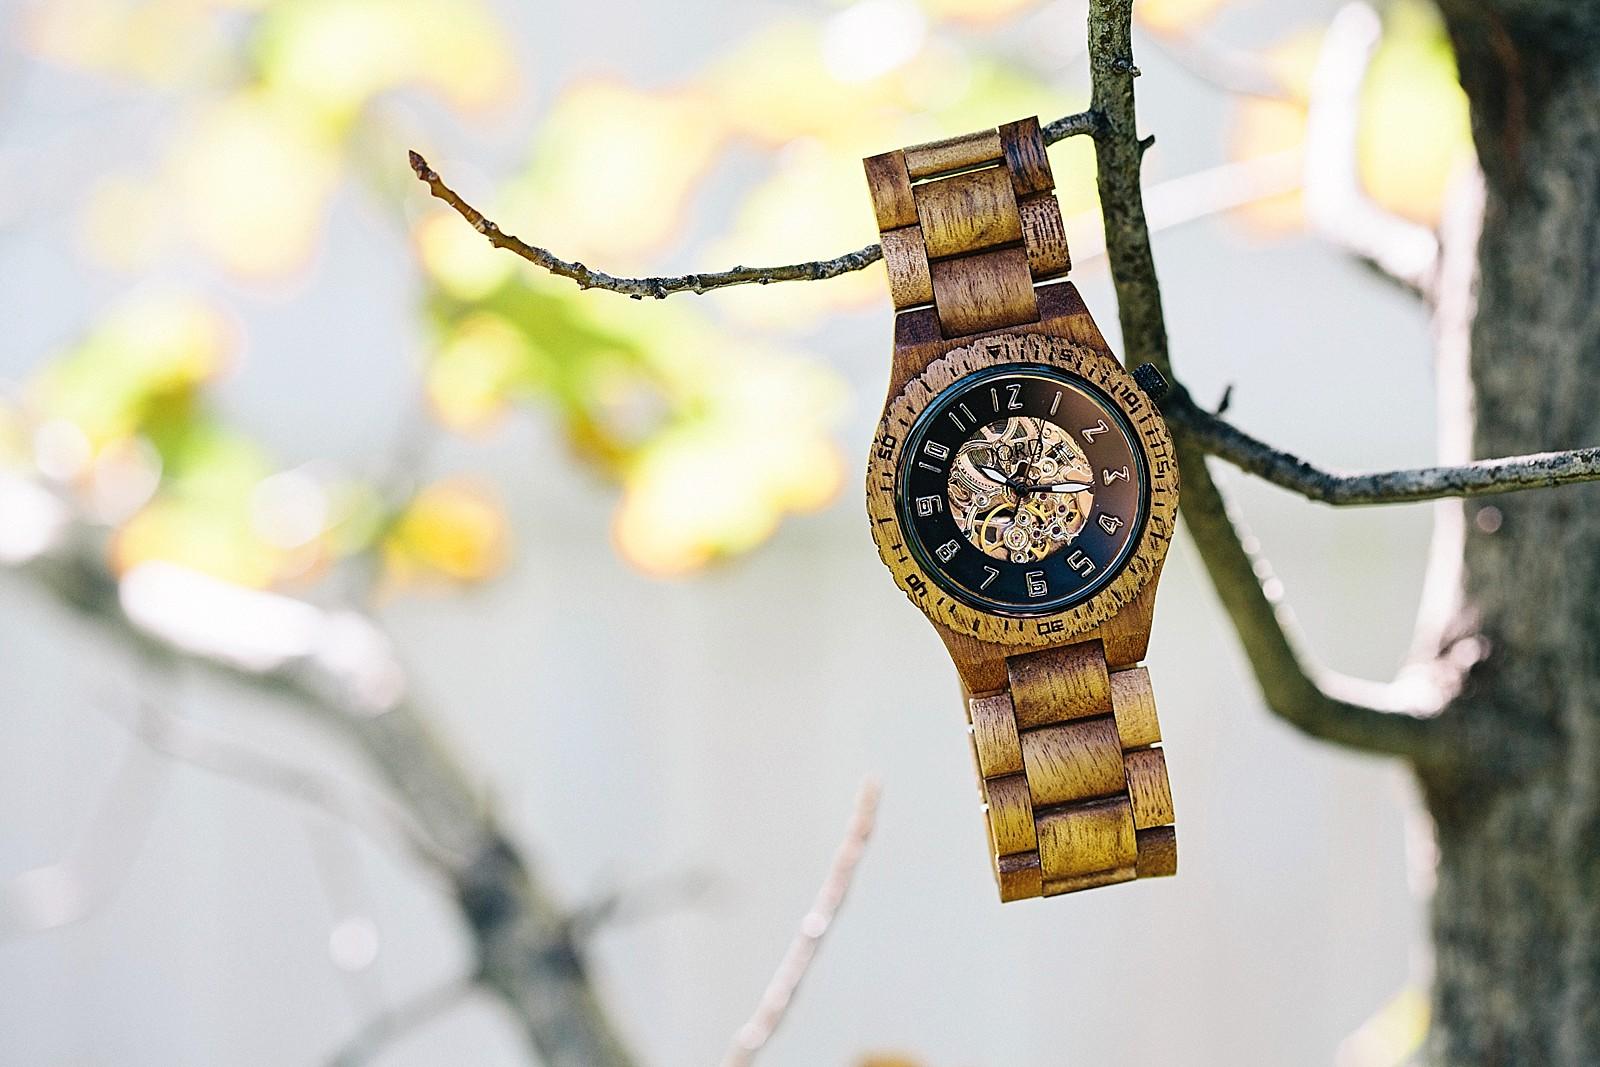 jord-wood-ladies-mens-wood-watch-unique-cool-gift-watch-1305